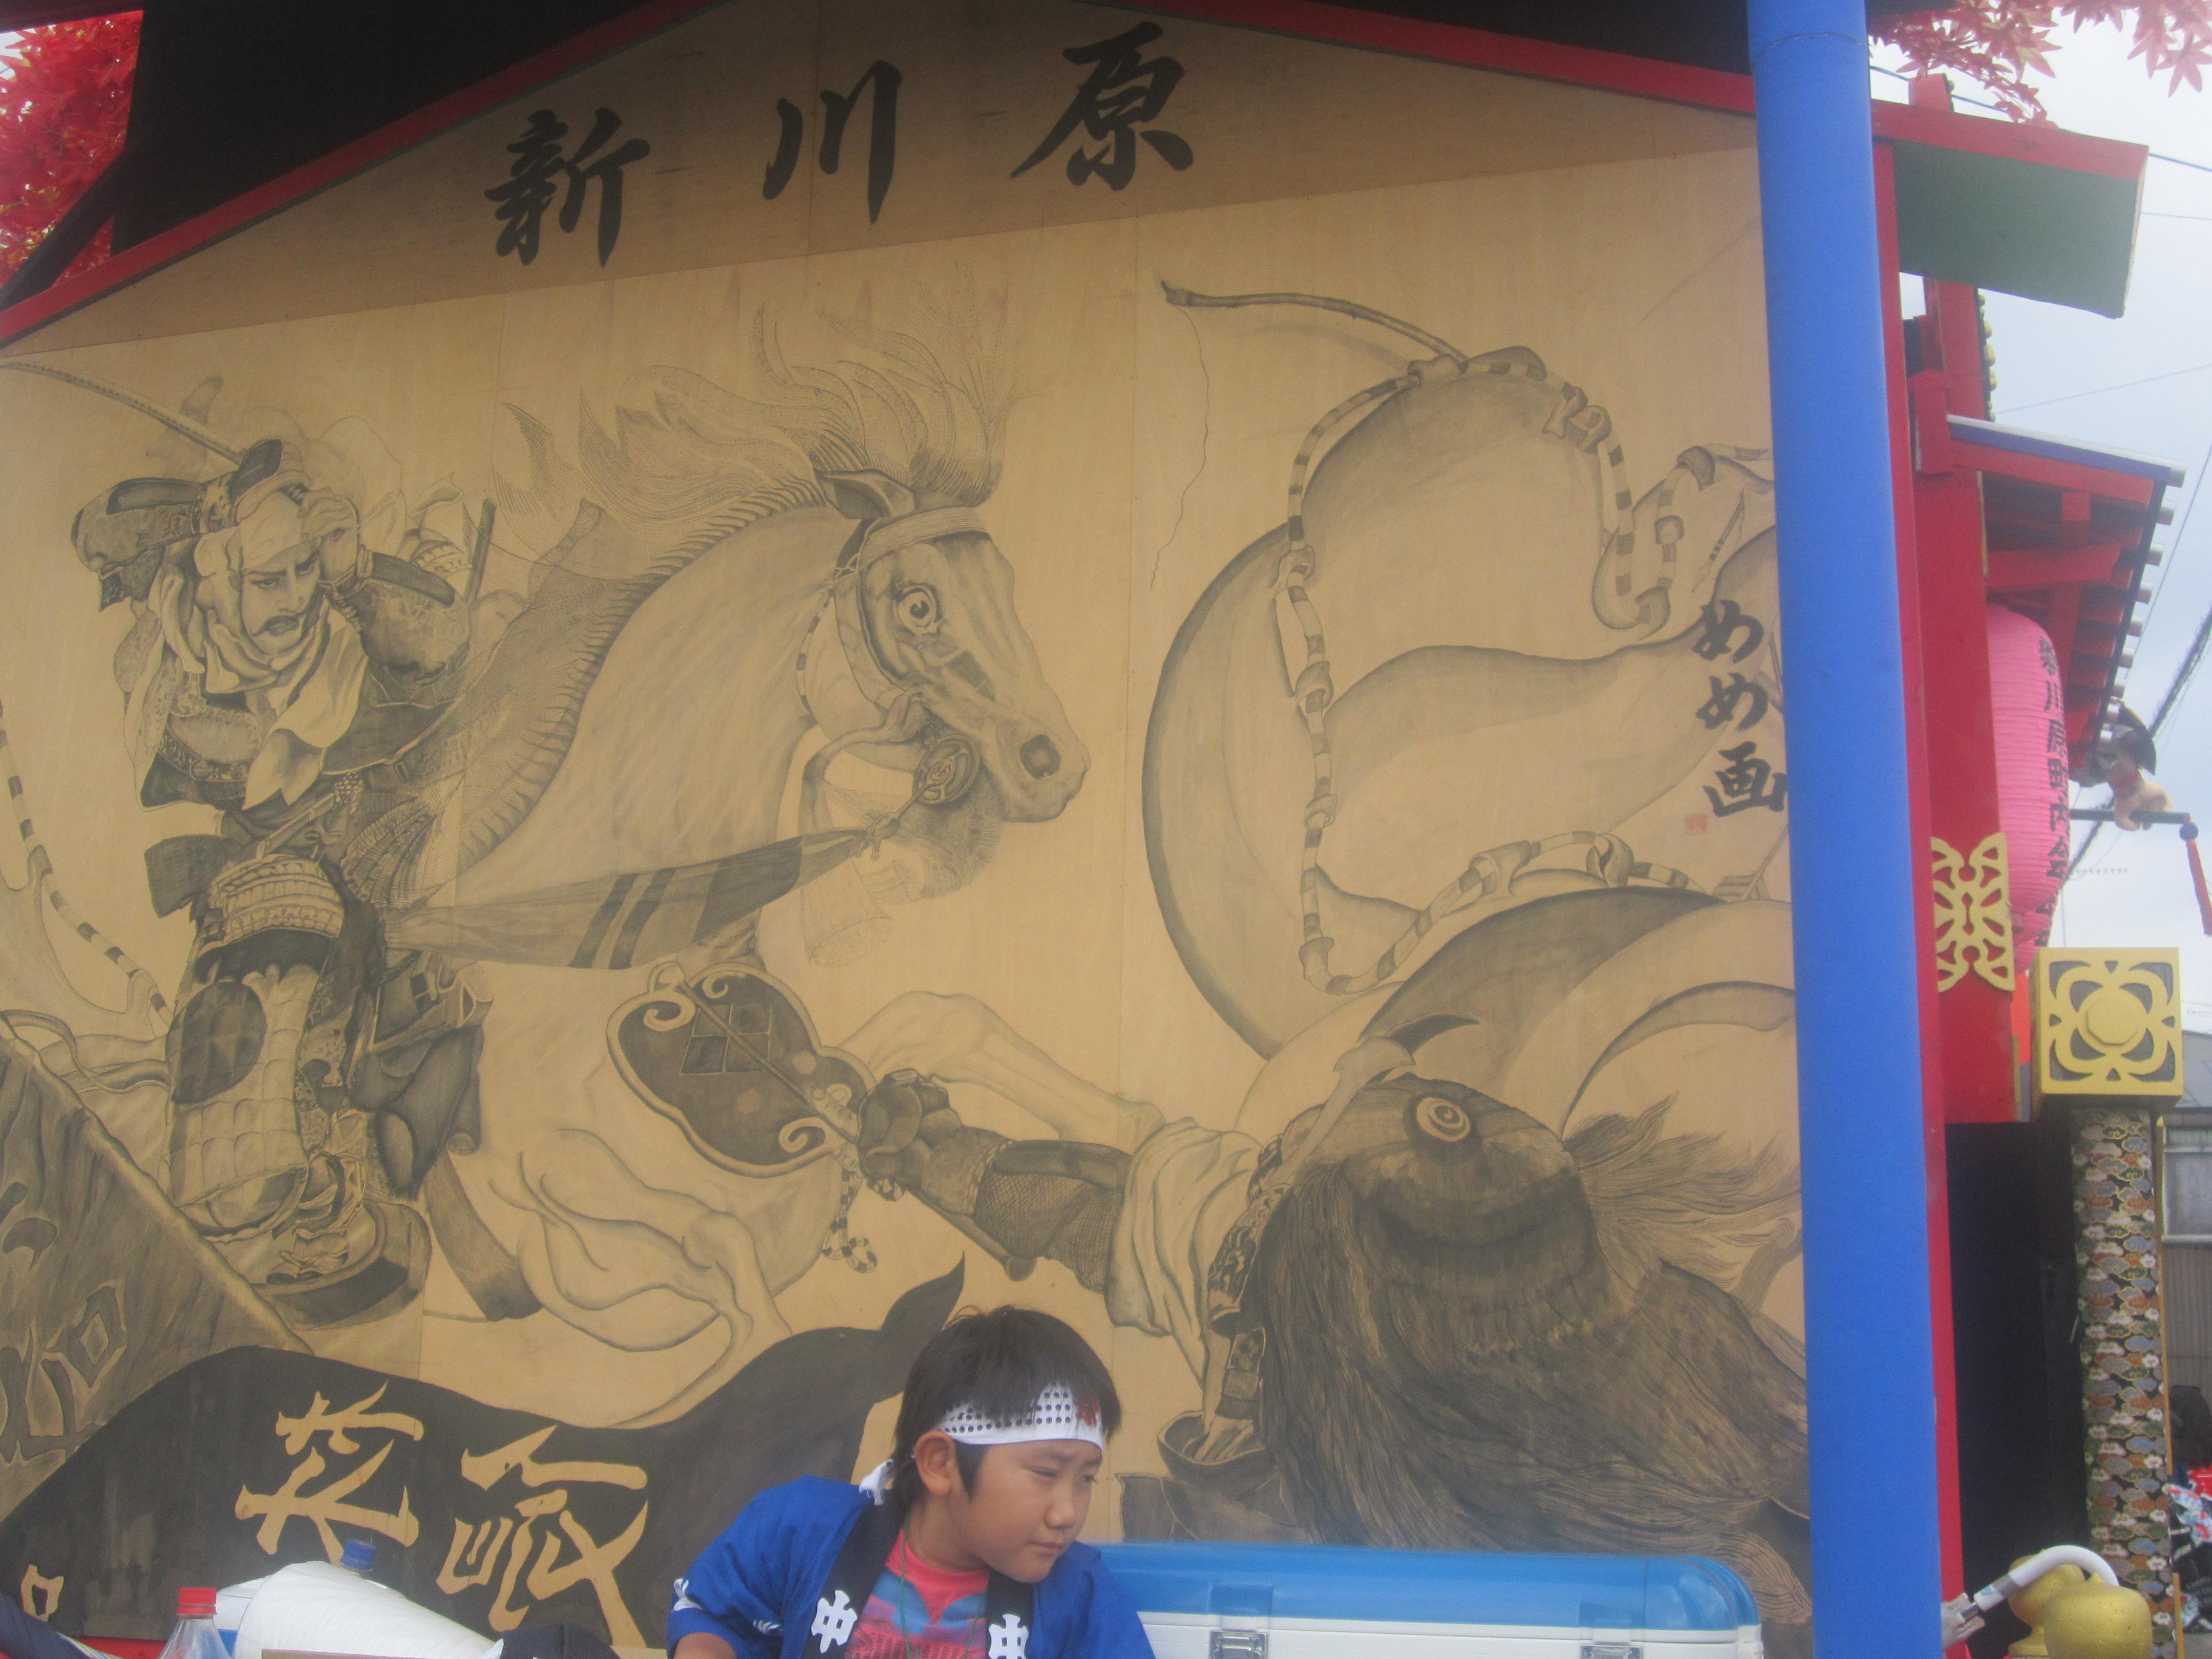 IMG 4246 - 麻布十番納涼祭り25,26日(七戸町出店)